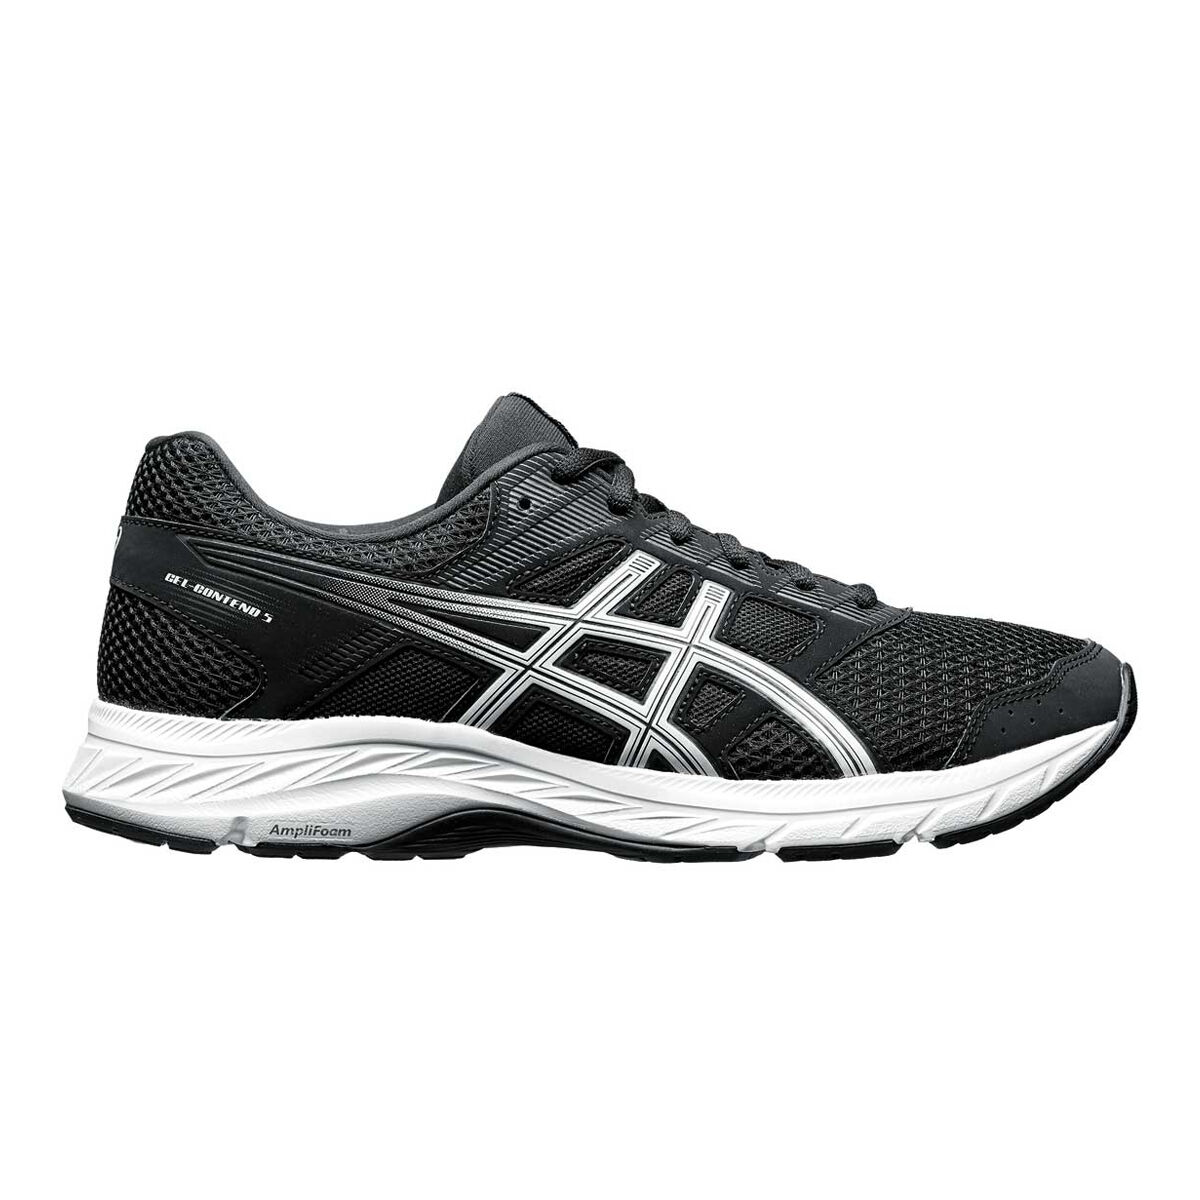 Asics Gel Contend 5 Mens Running Shoes